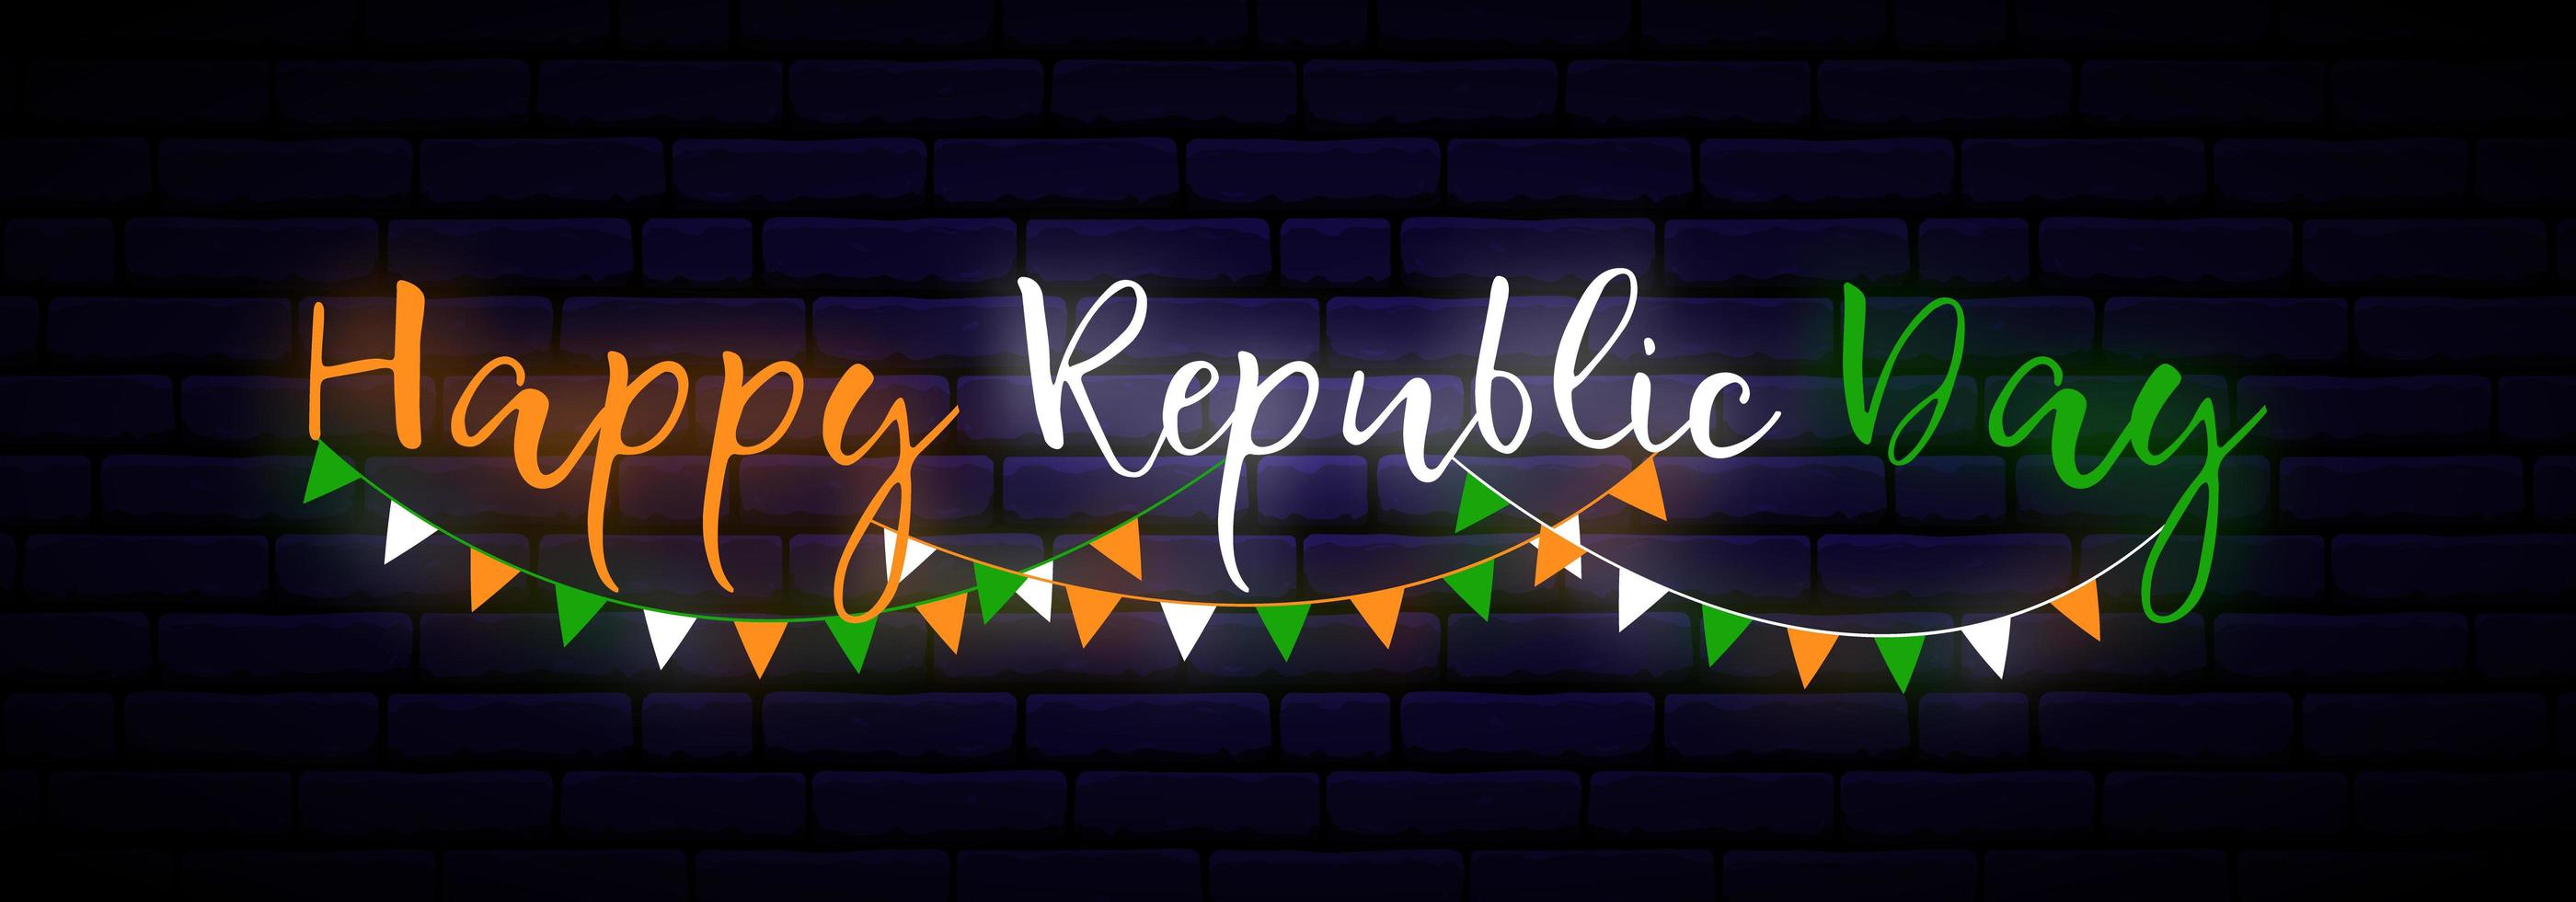 banner horizontal de néon do dia da República da Índia feliz. vetor